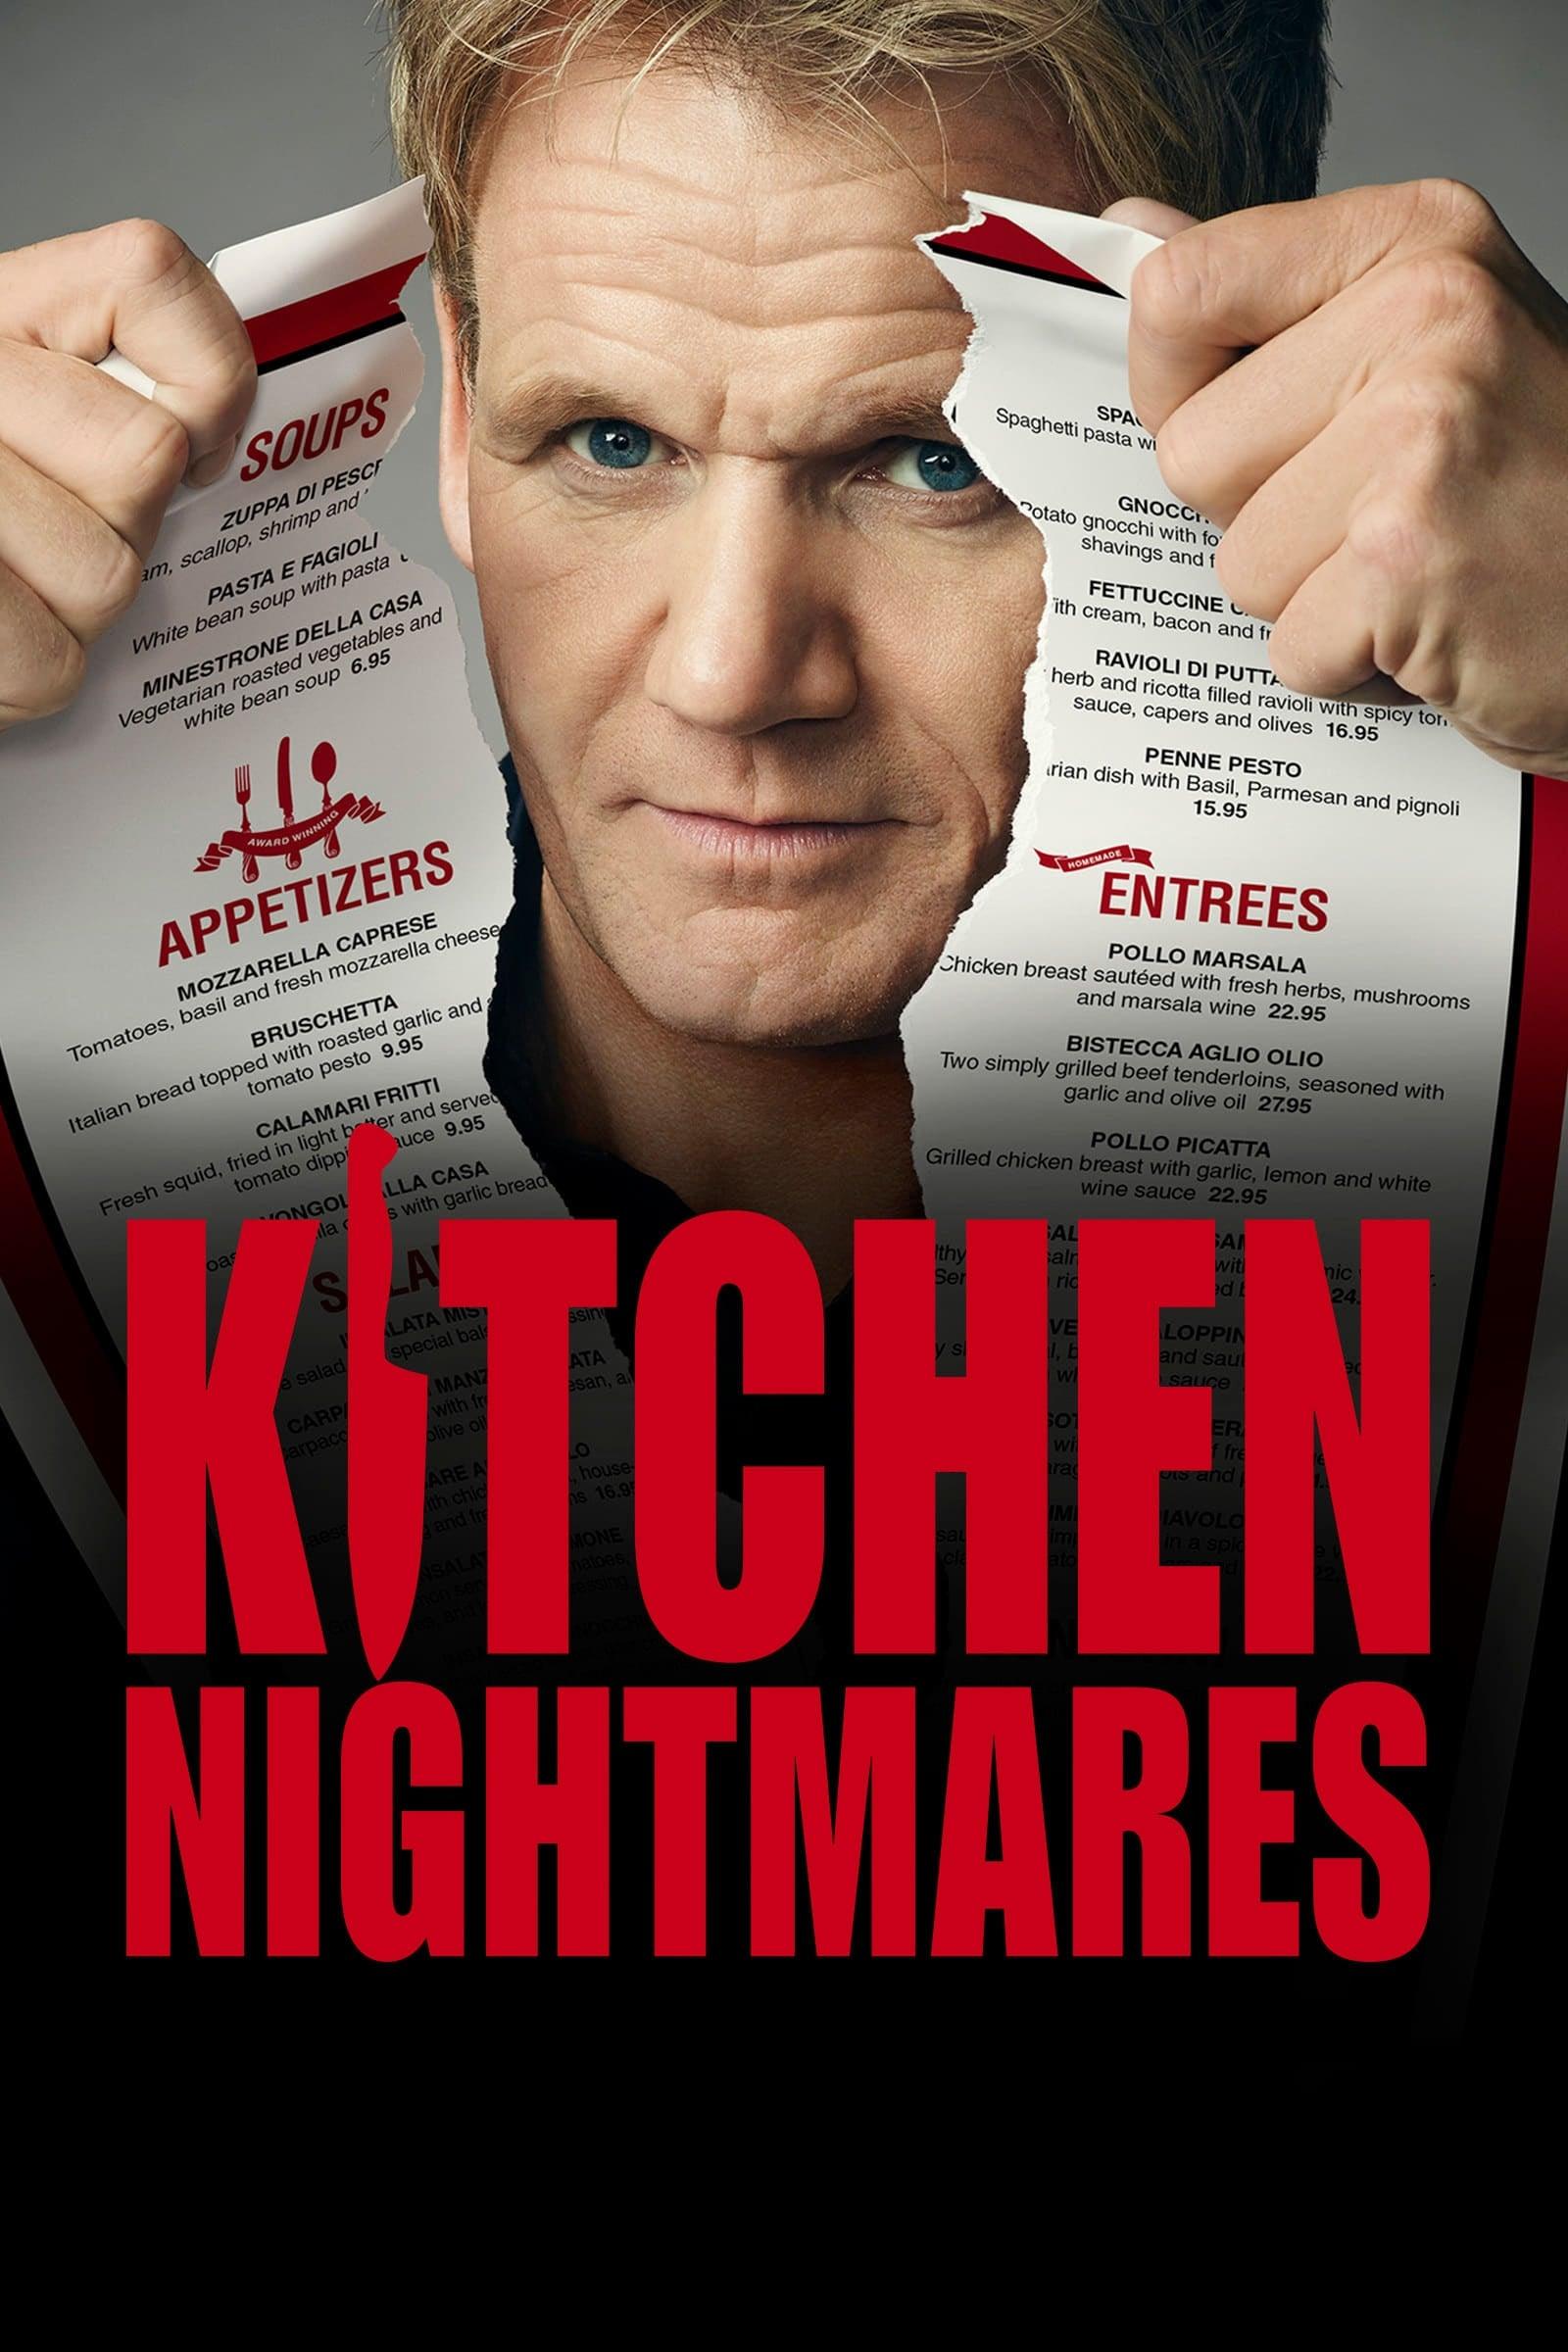 Kitchen Nightmares US